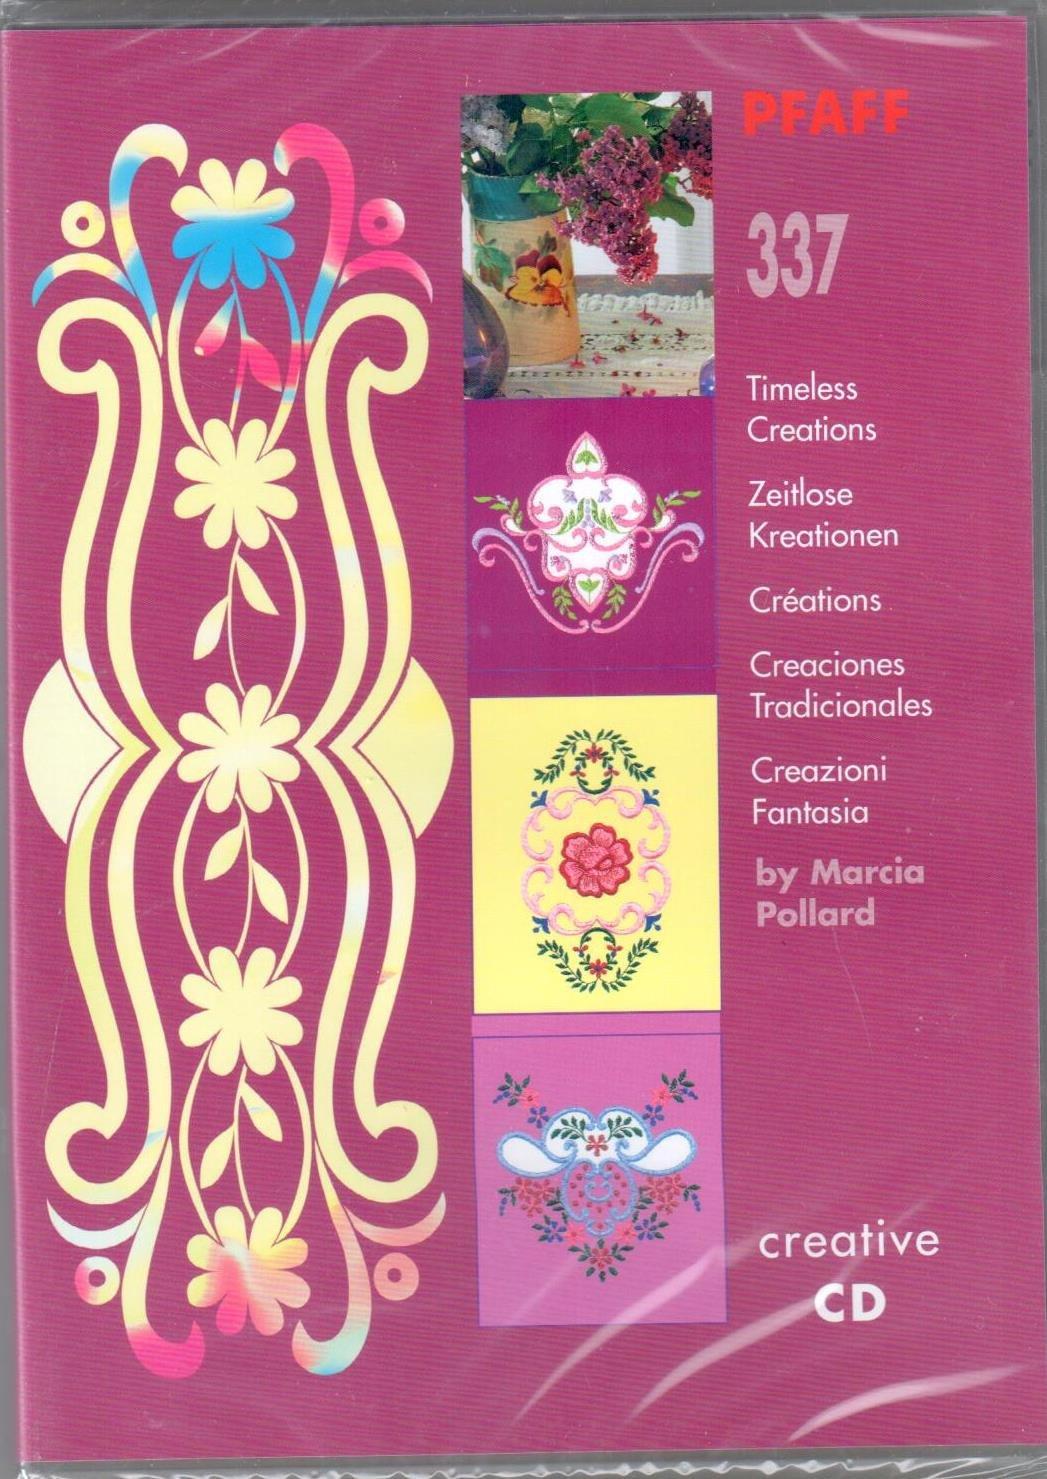 Pfaff Creative CD 337 Timeless Creatiions